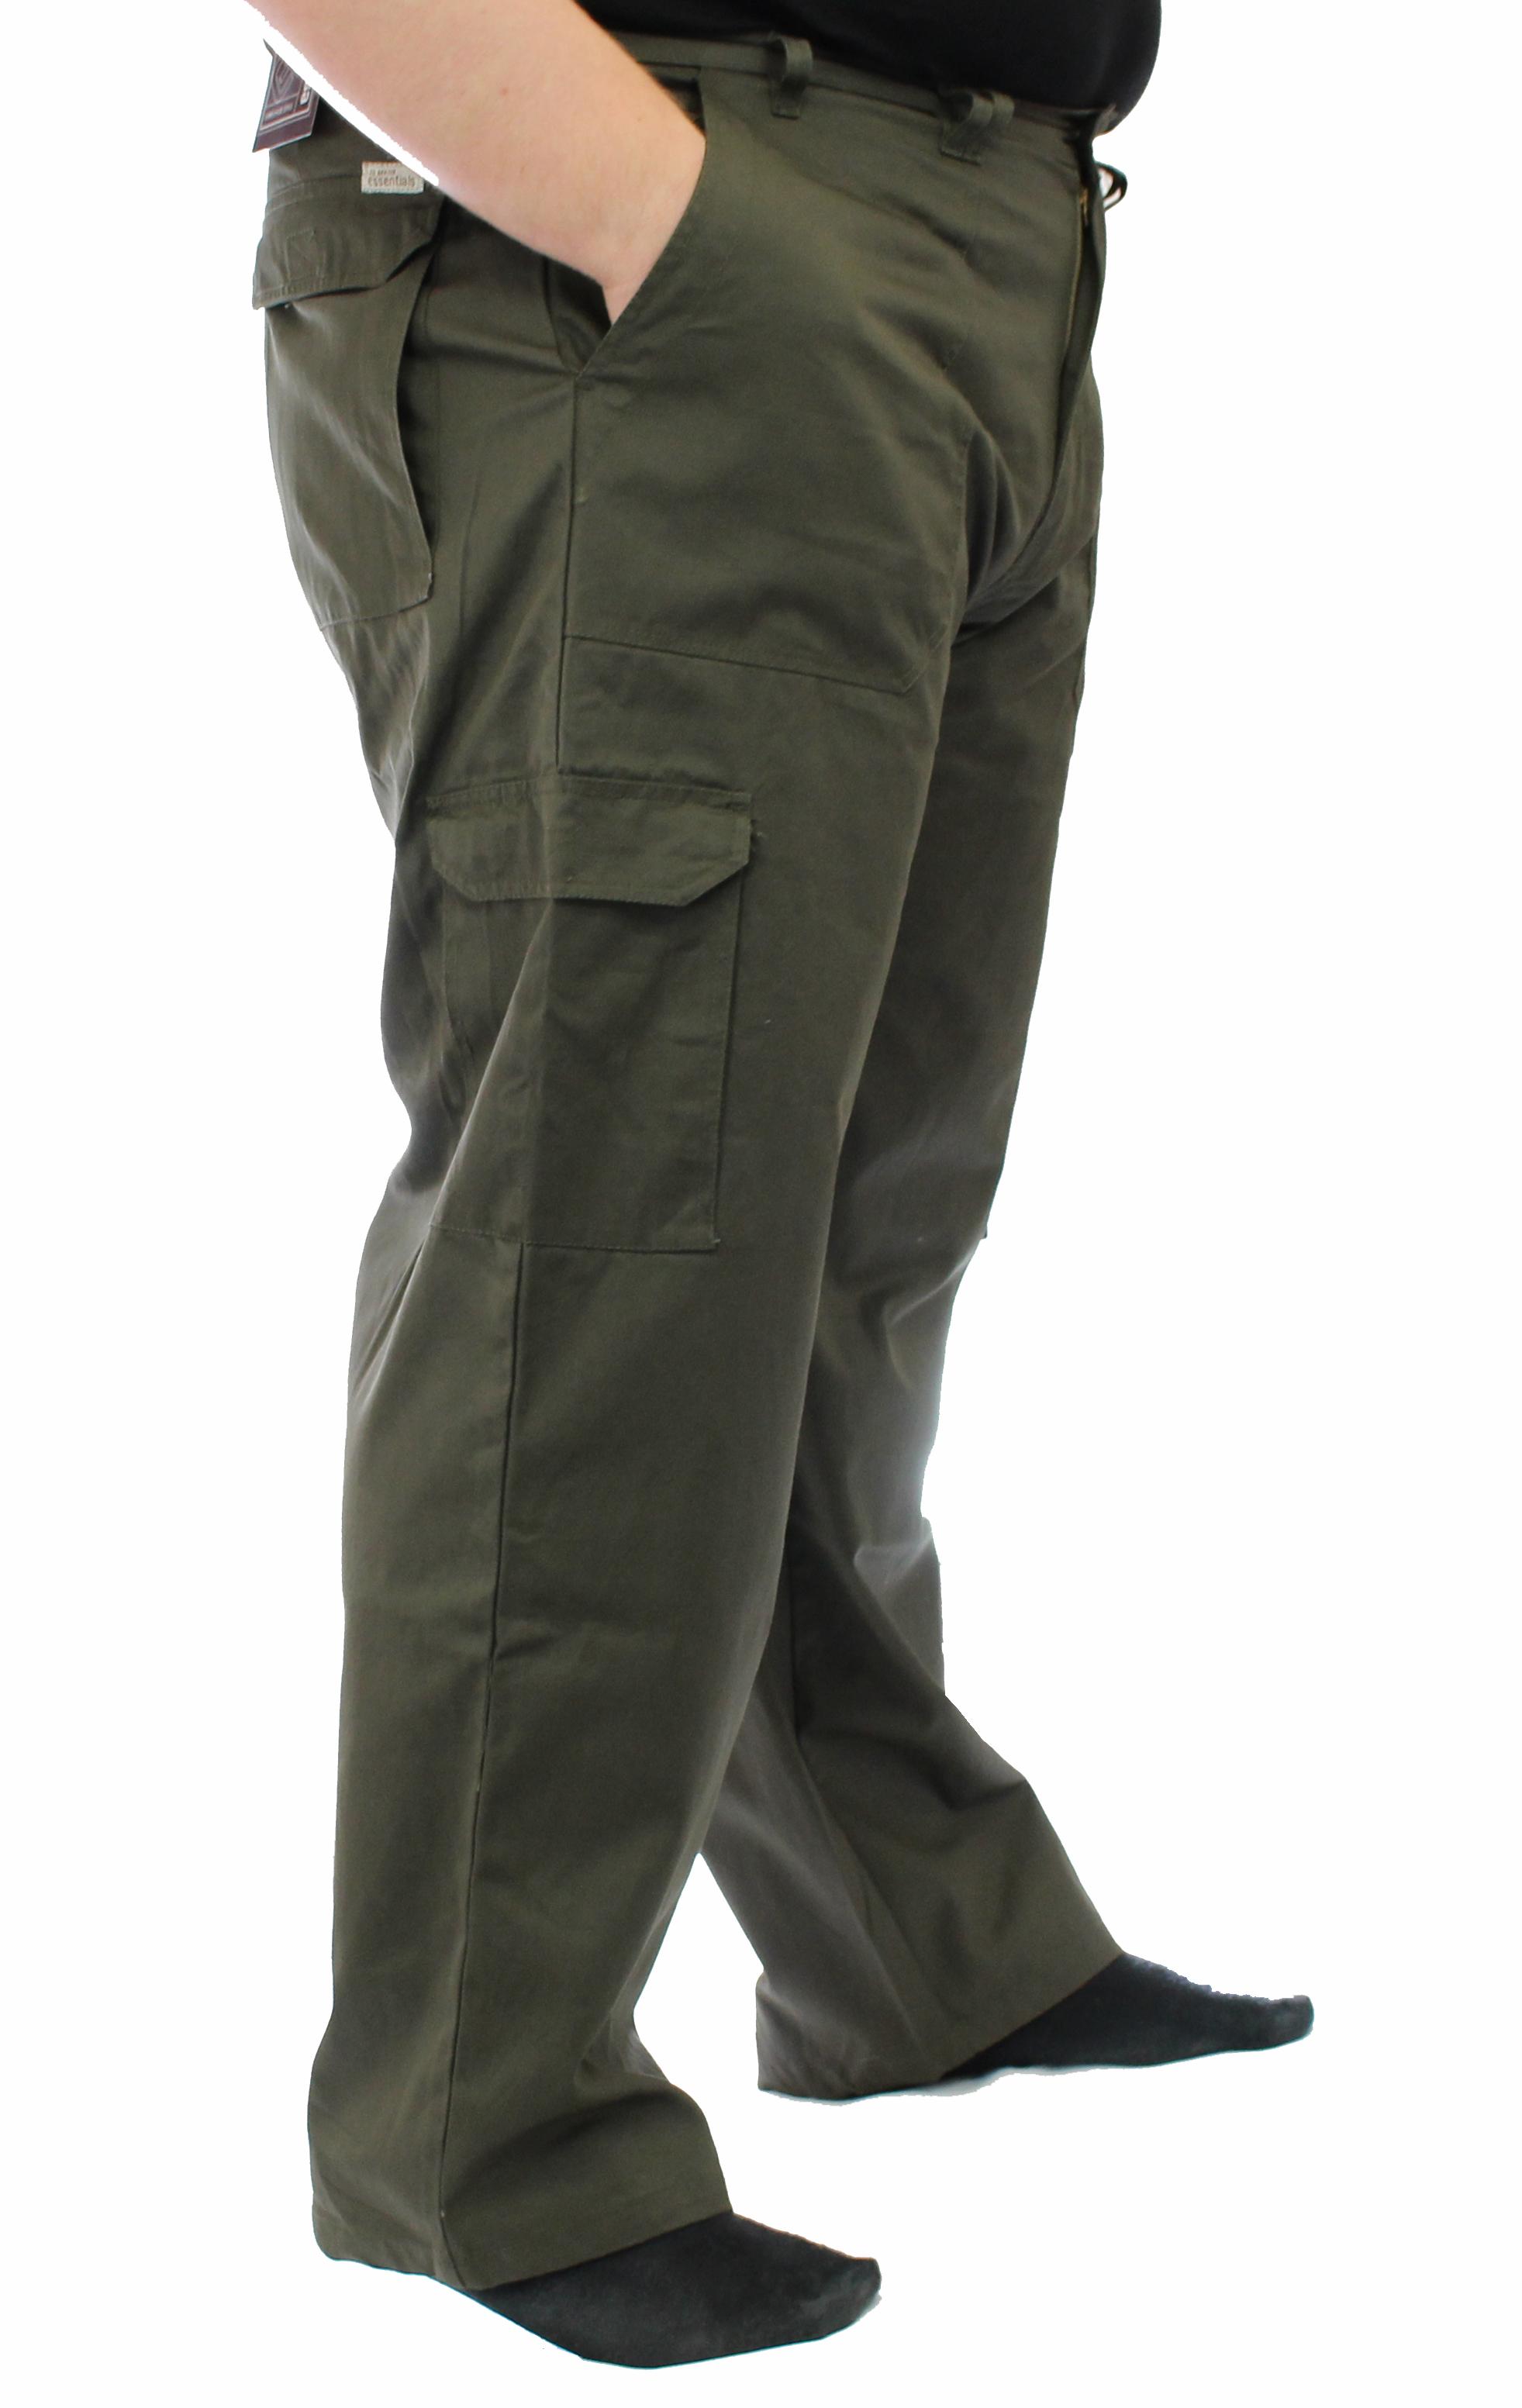 "Ed Baxter Victory - Heavy Duty Cargo Combat Trousers - Khaki - 44"" Waist, 32"" Leg"